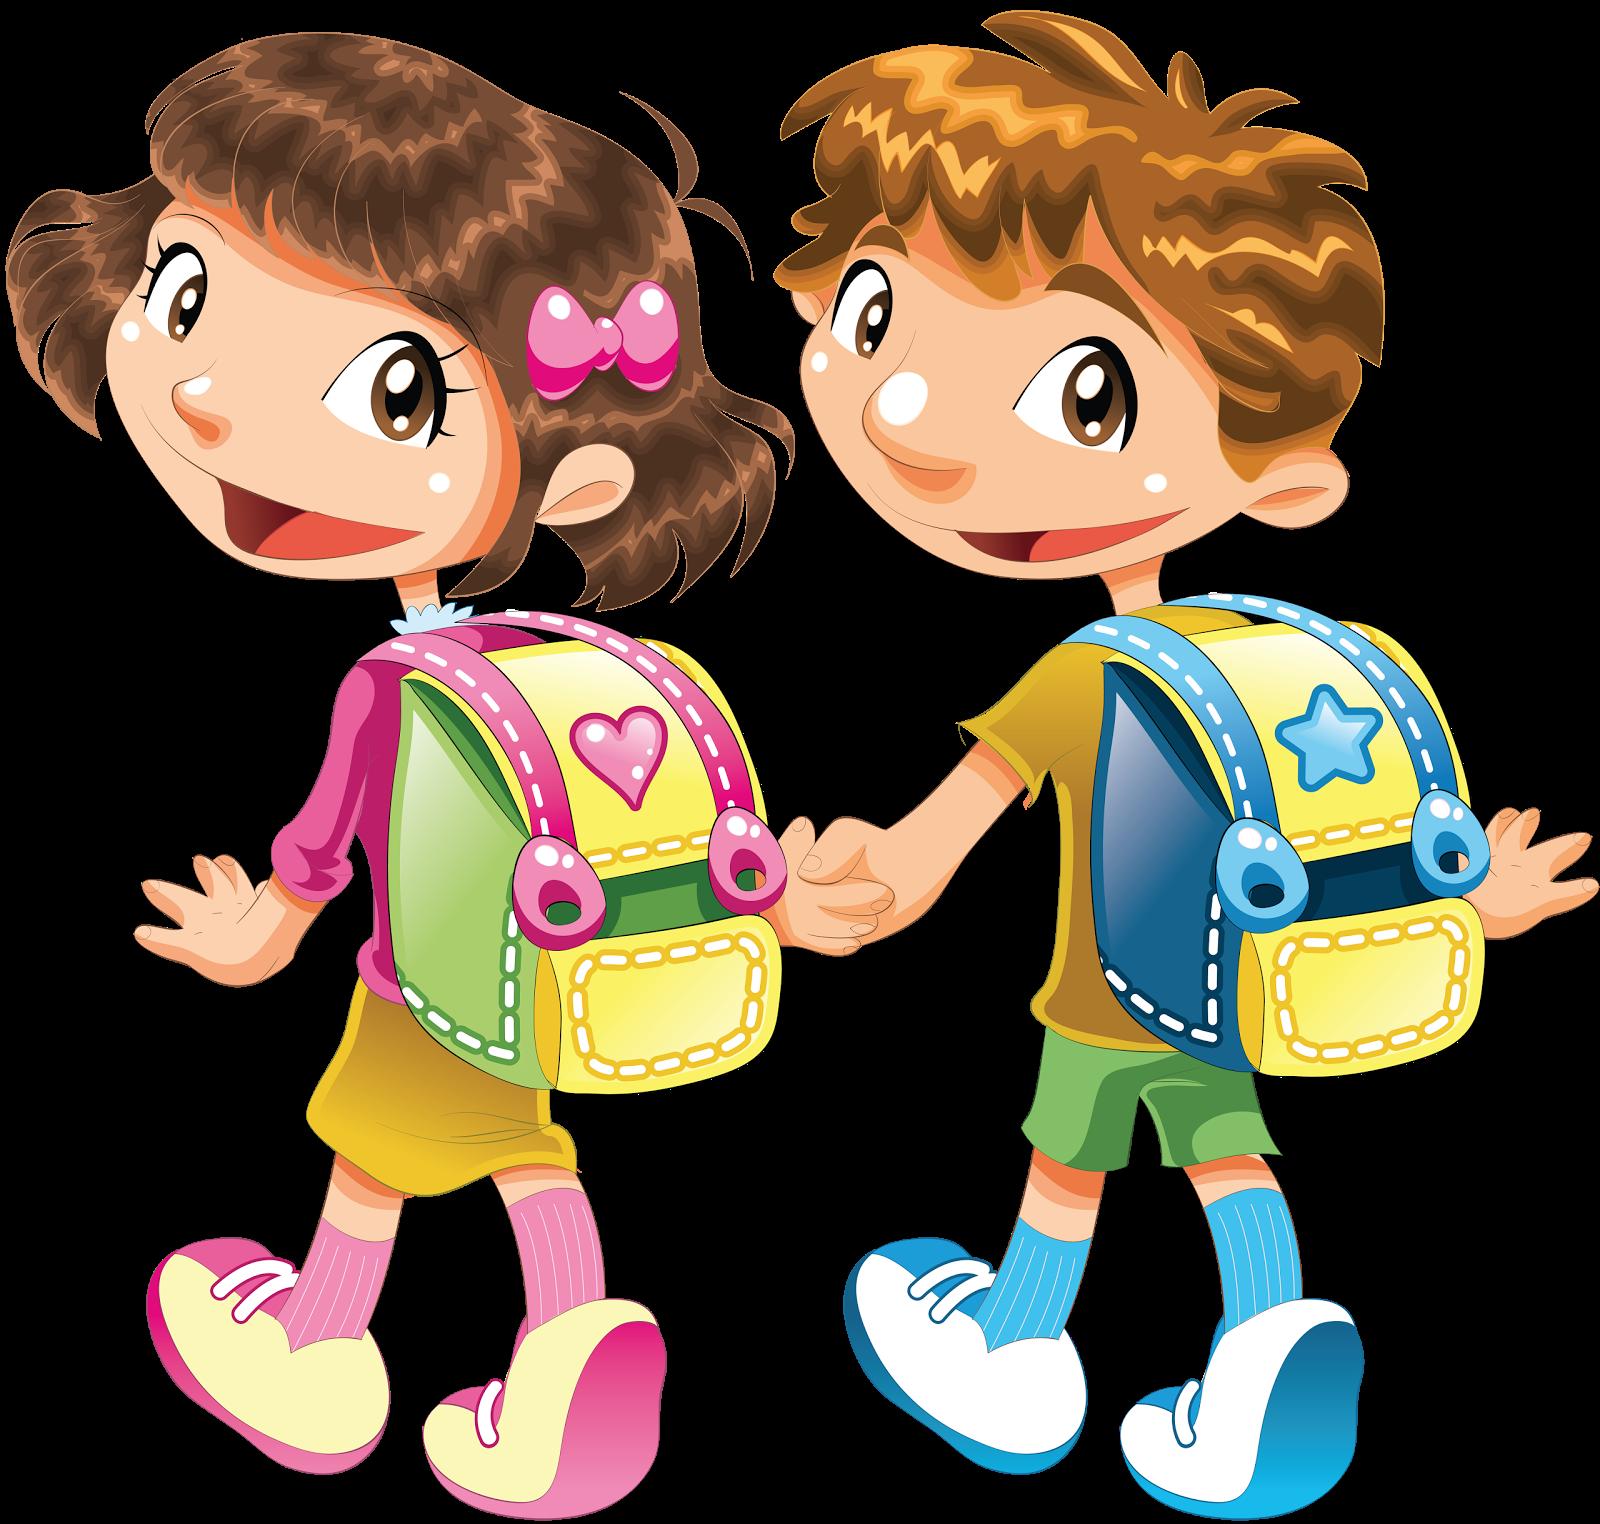 Play school clipart picture freeuse download dibujos niños png - Buscar con Google | Дети | Pinterest | School ... picture freeuse download